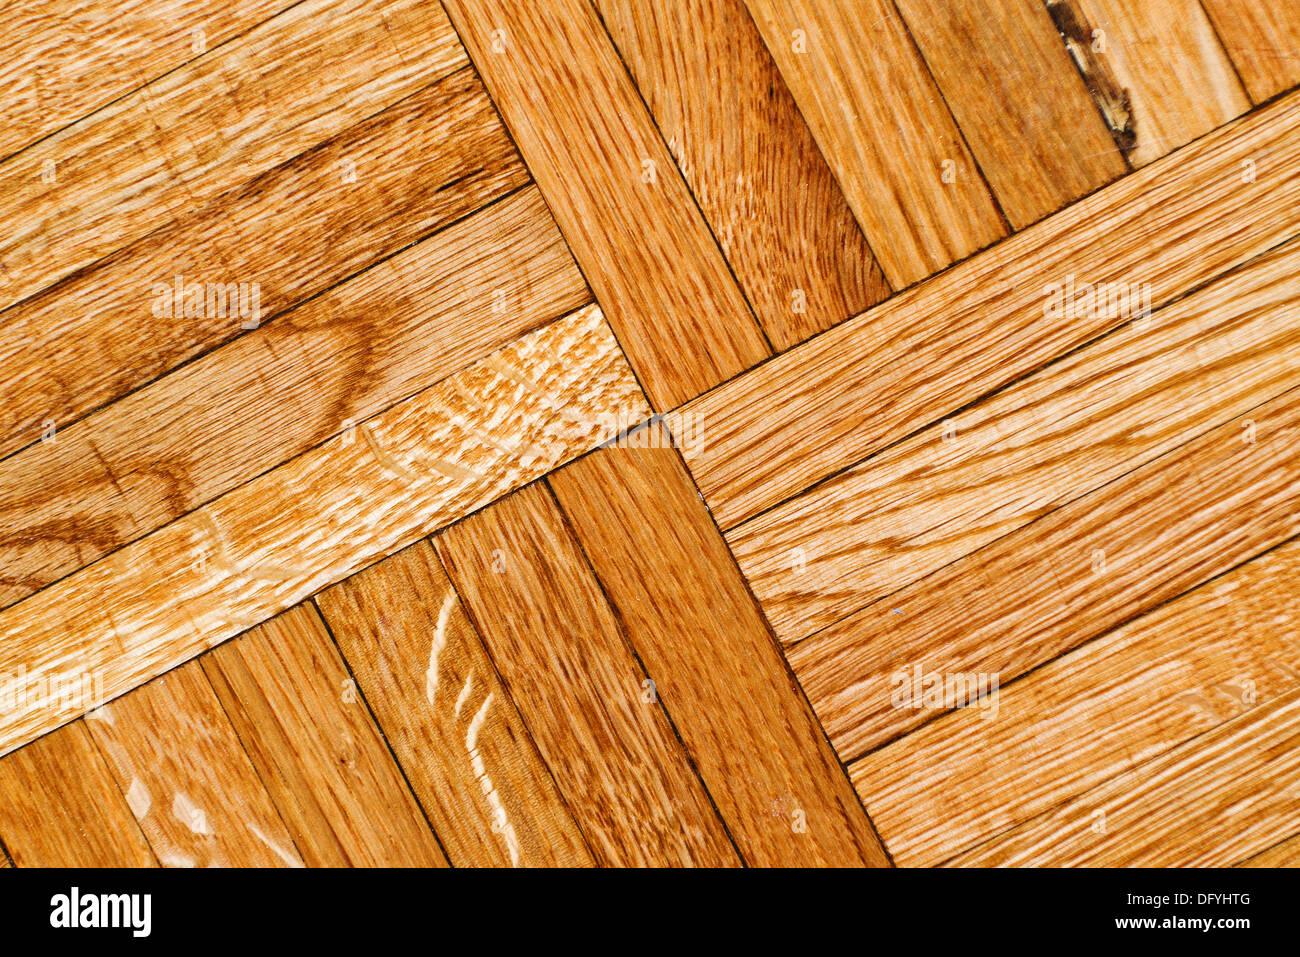 Oak parquet texture, home interior background image. - Stock Image